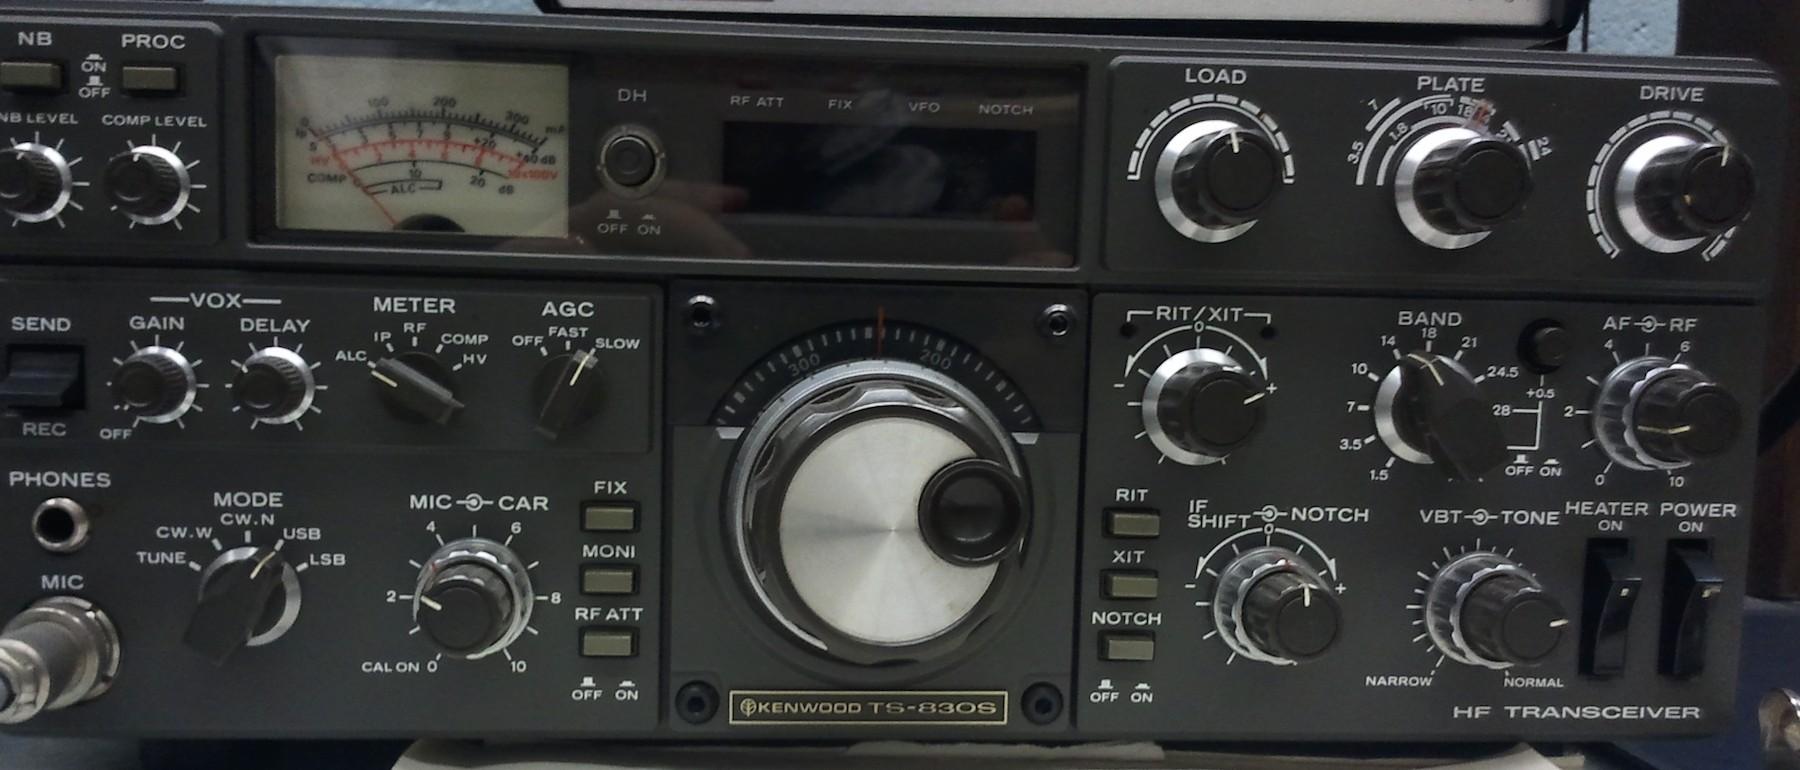 kenwood ts 830s amateur radio club rh w2aee columbia edu ts-830s service manual ts 820s manual